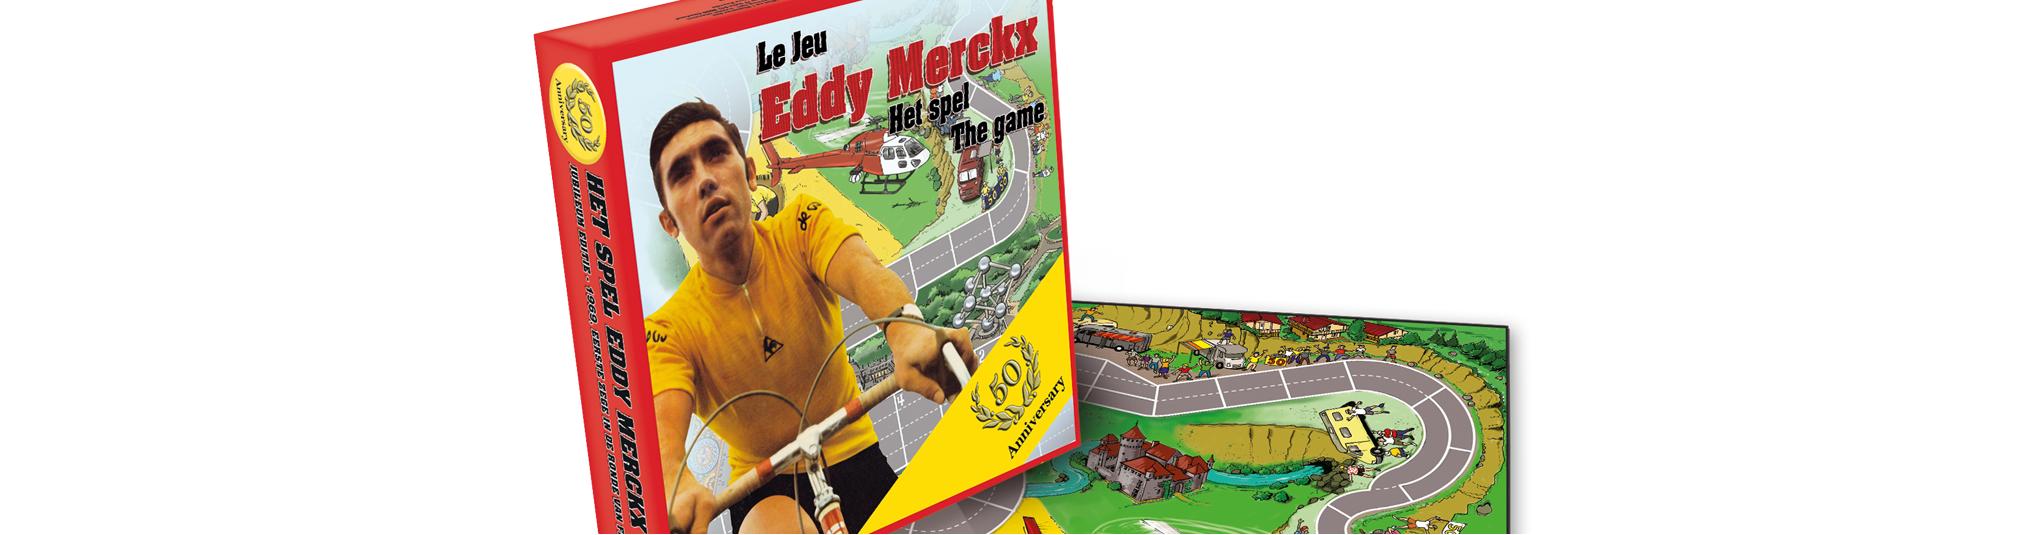 Jeu Eddy Merckx